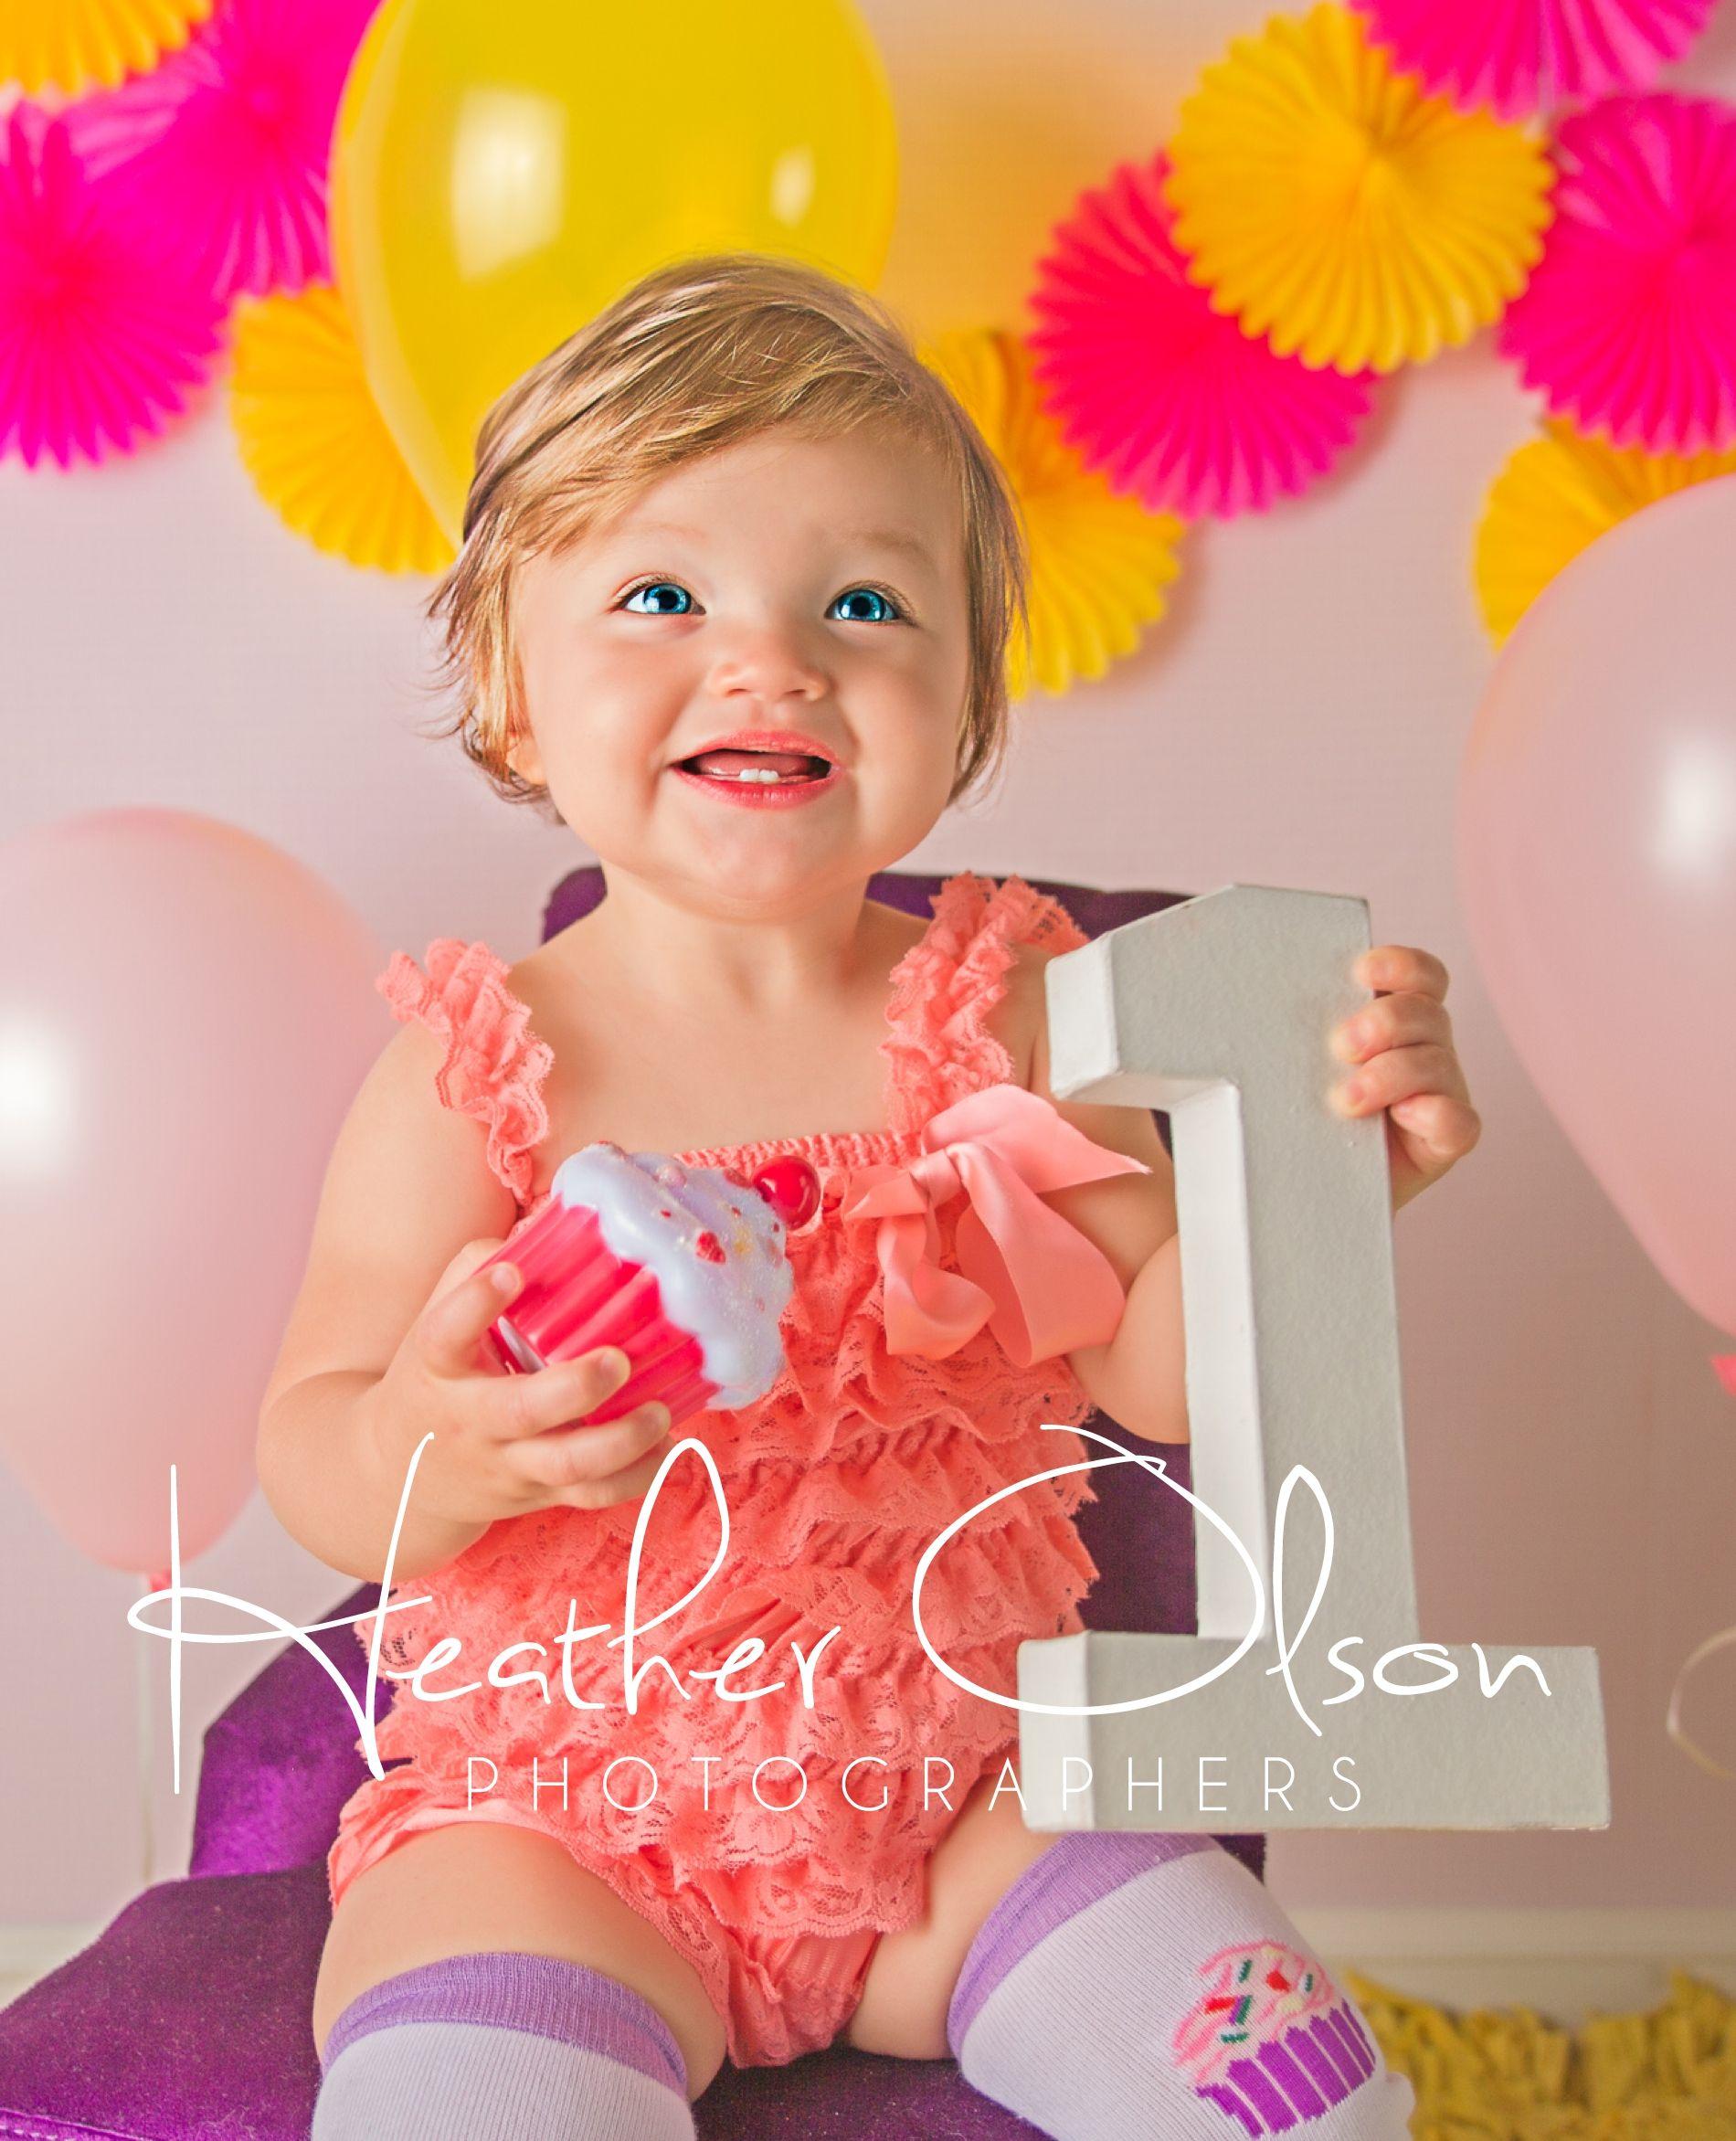 Birthday Party Ideas Augusta Ga: Heather Olson Photographers, Newborn And Child Photography